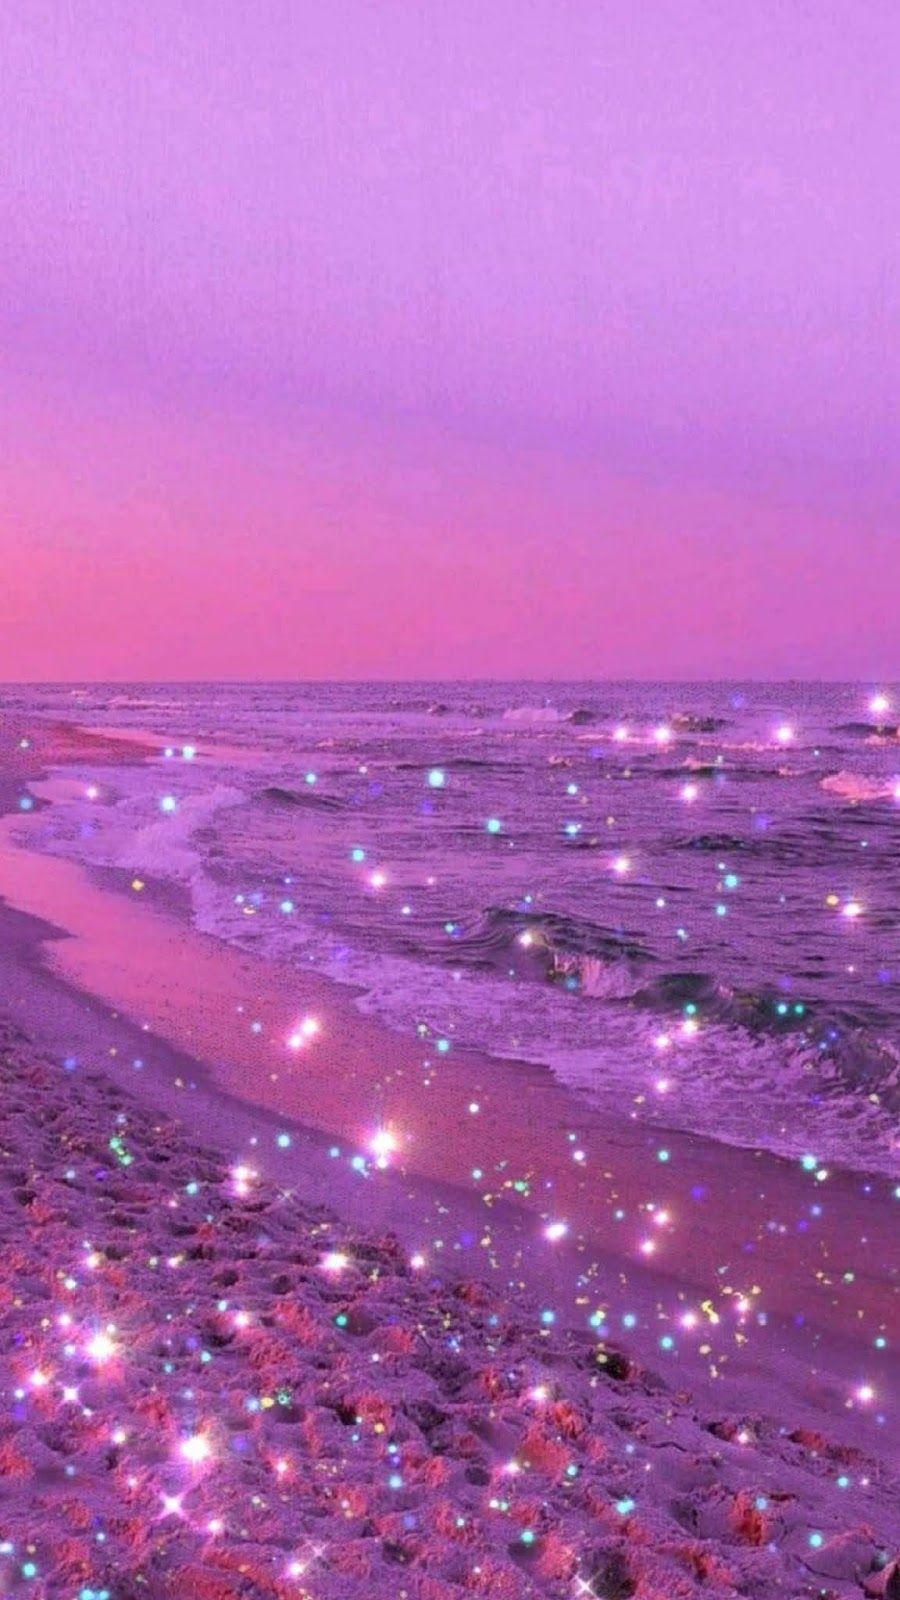 Ms Designer صور السماء و الغيوم خلفيات السماء و الغيوم خلفيات الفضاء خلفيات ا In 2021 Sparkle Wallpaper Aesthetic Pastel Wallpaper Pink Tumblr Aesthetic